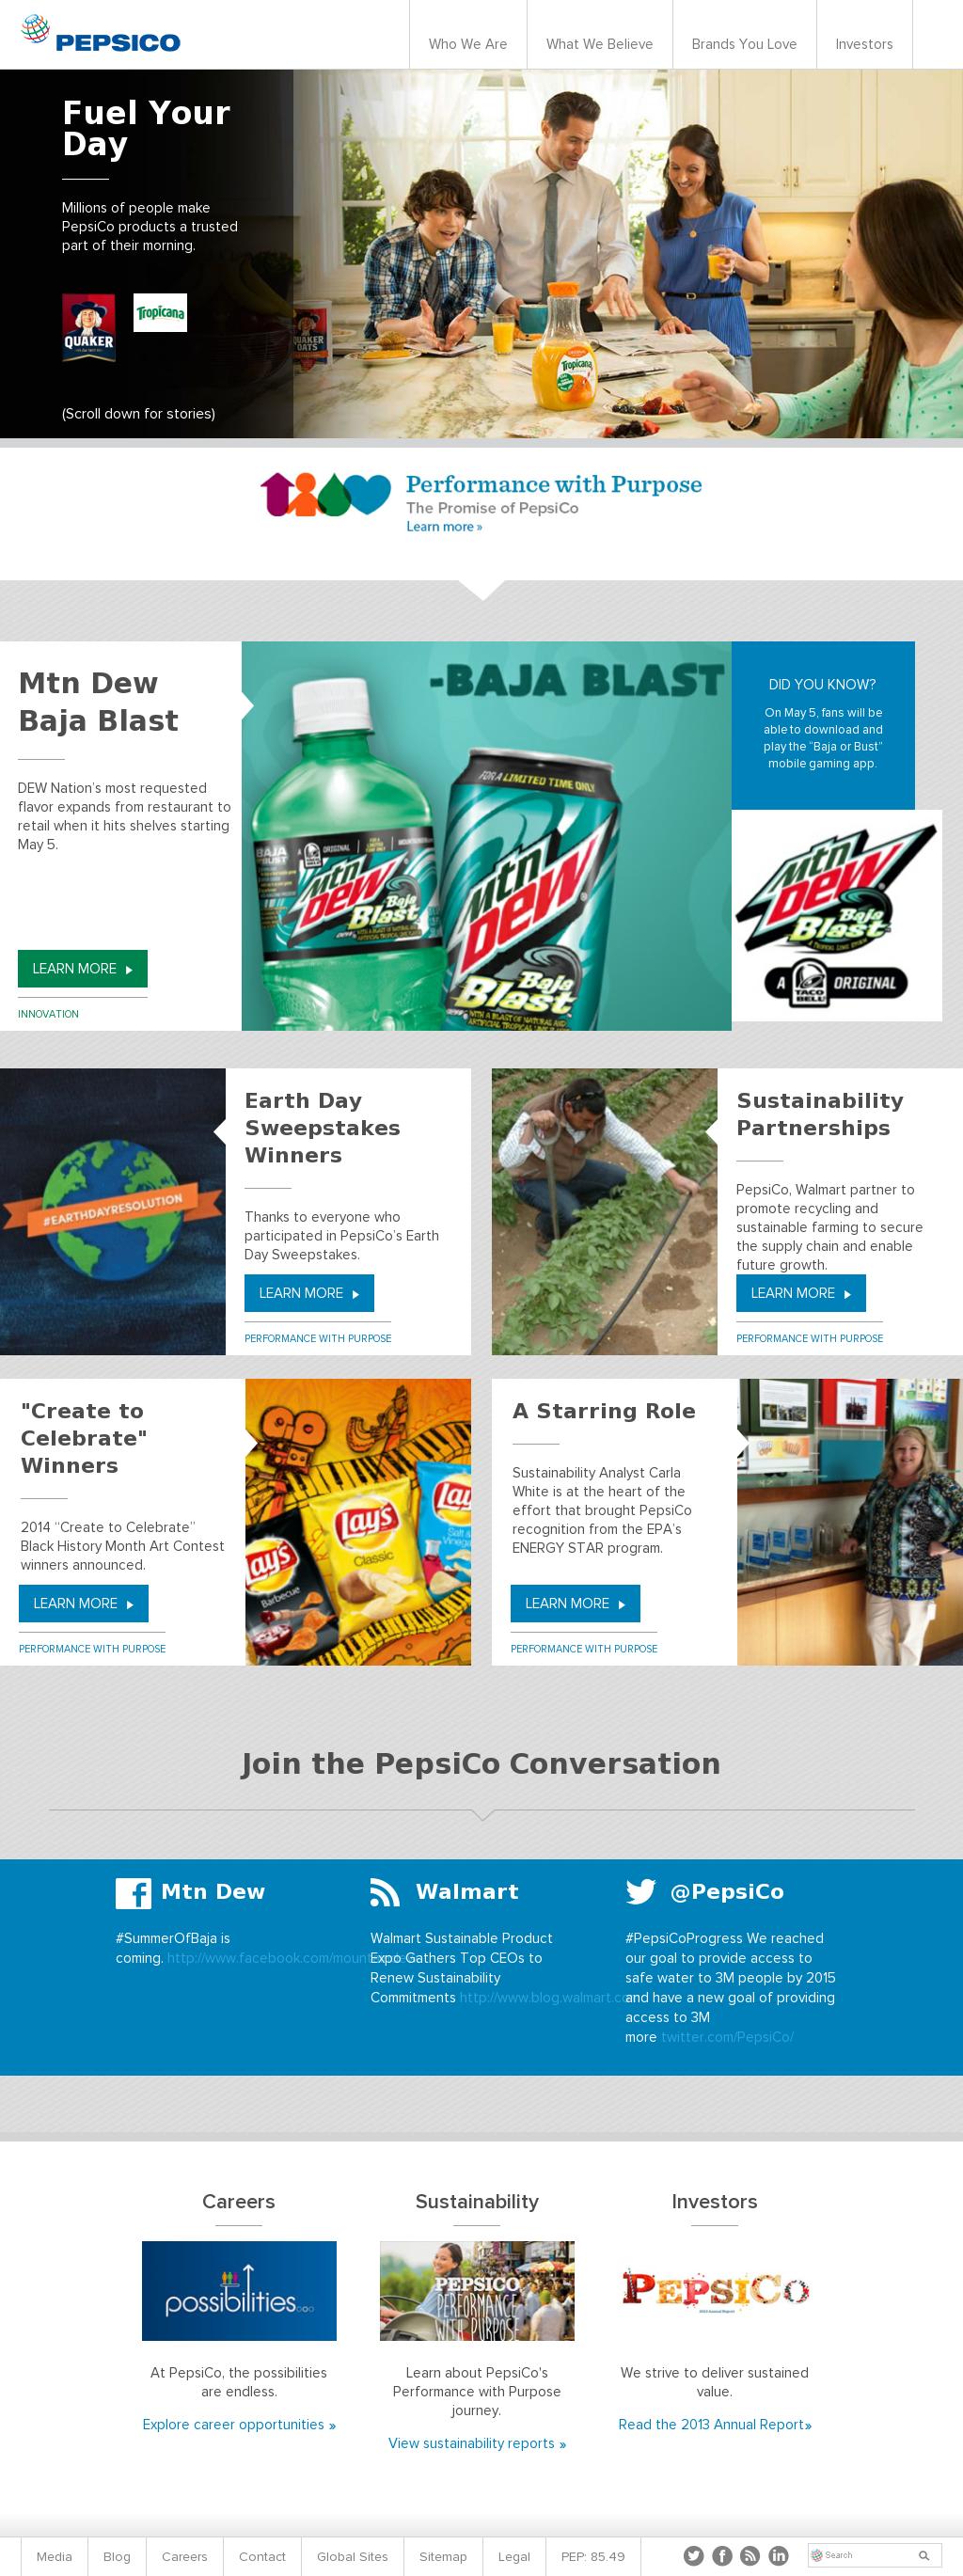 PepsiCo Competitors, Revenue and Employees - Owler Company